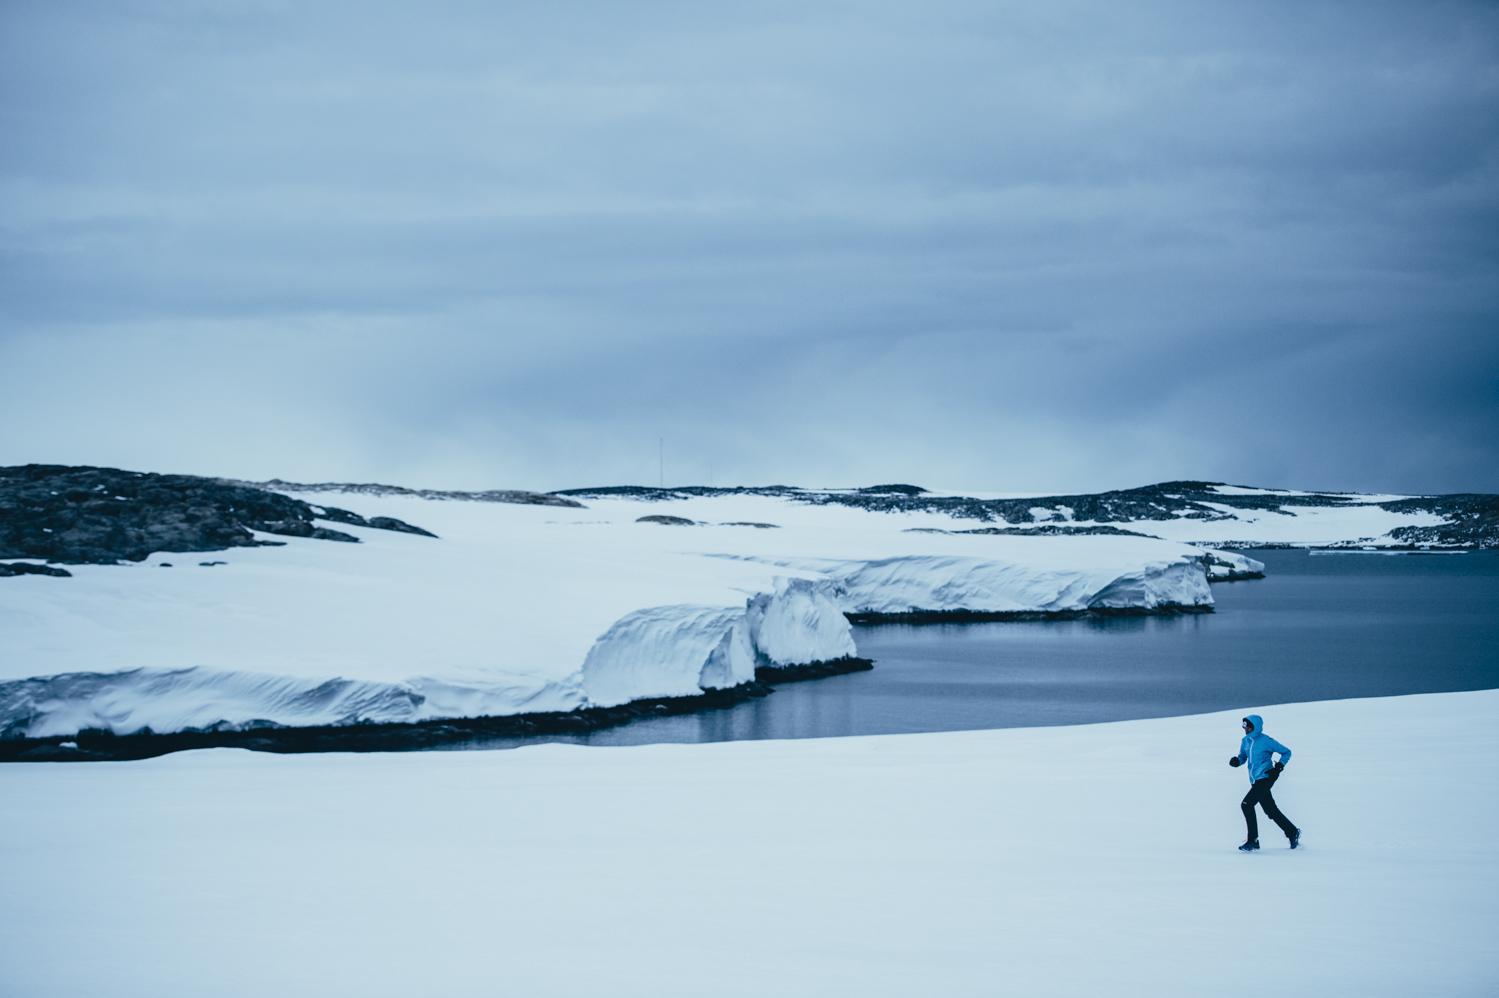 KT_160222_7D_Antarctica_1254.jpg